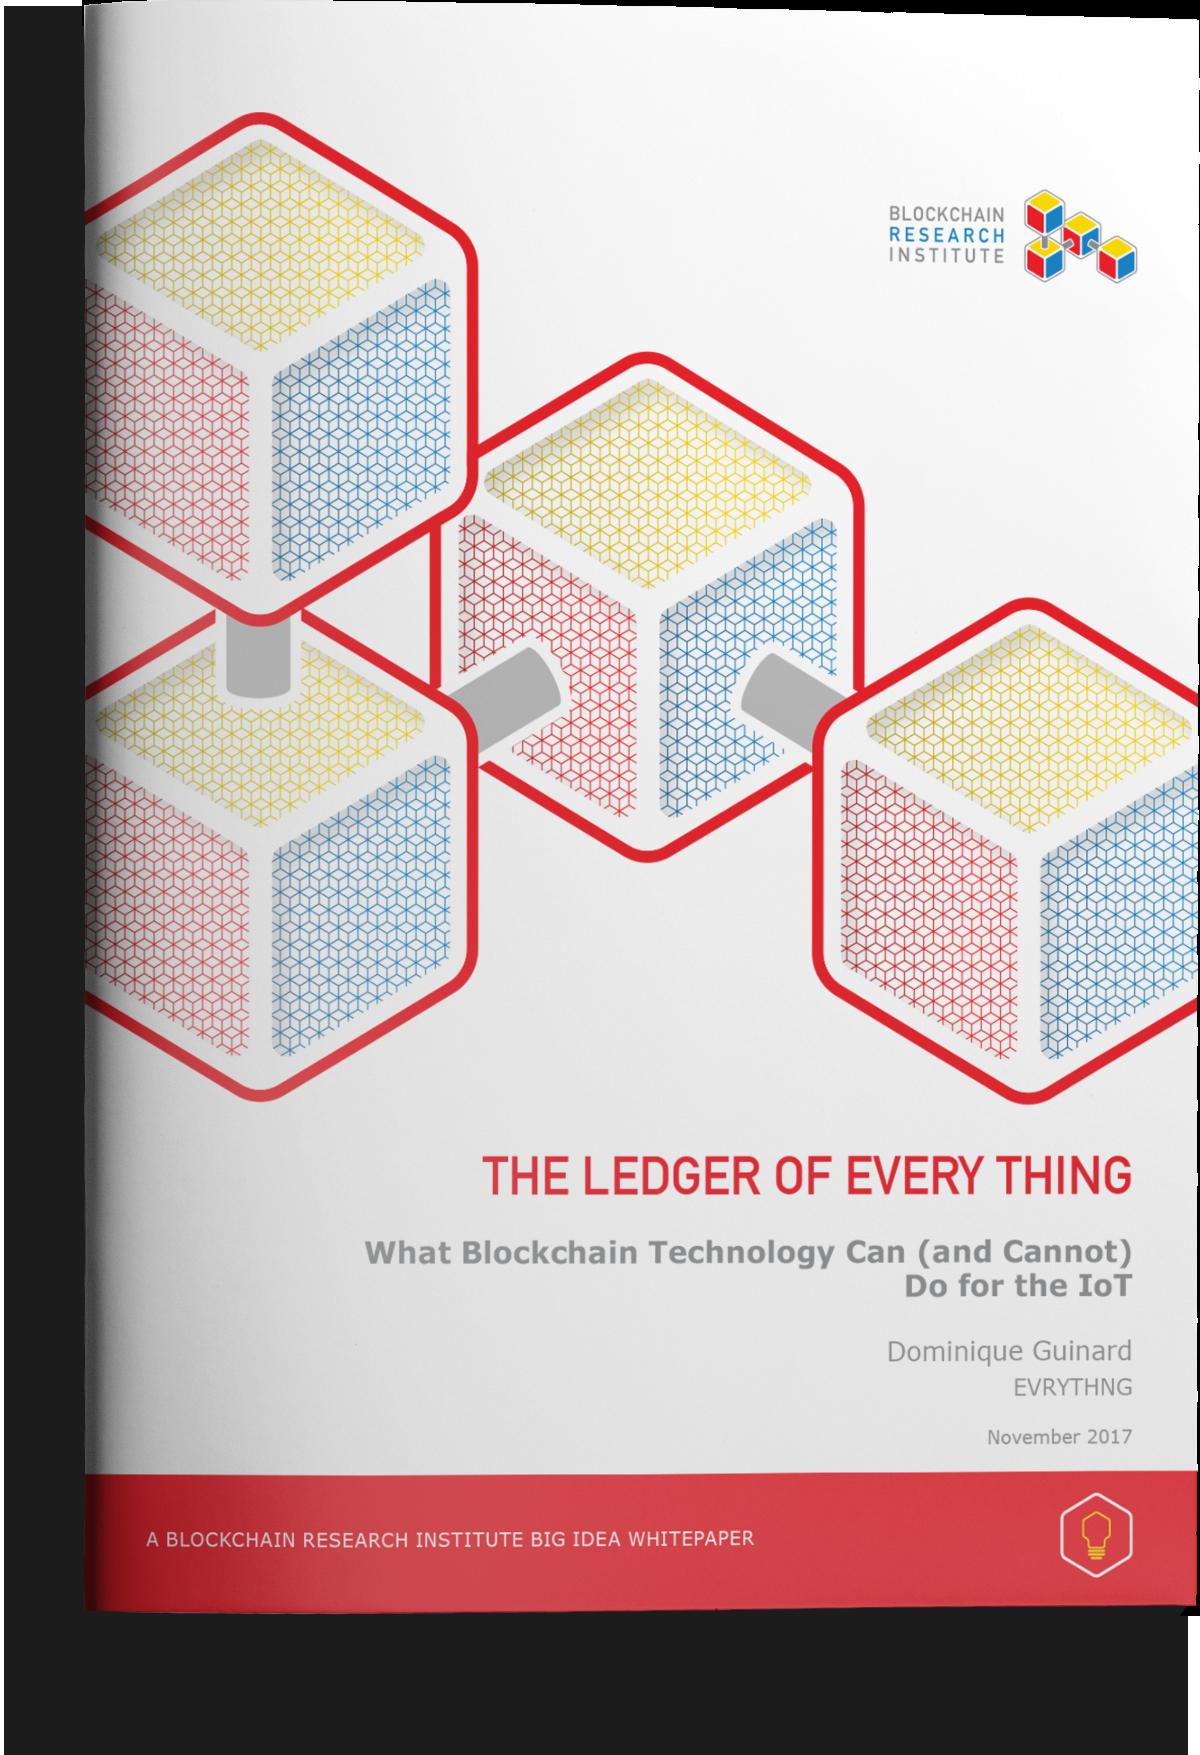 blockchain-wp-cover-image